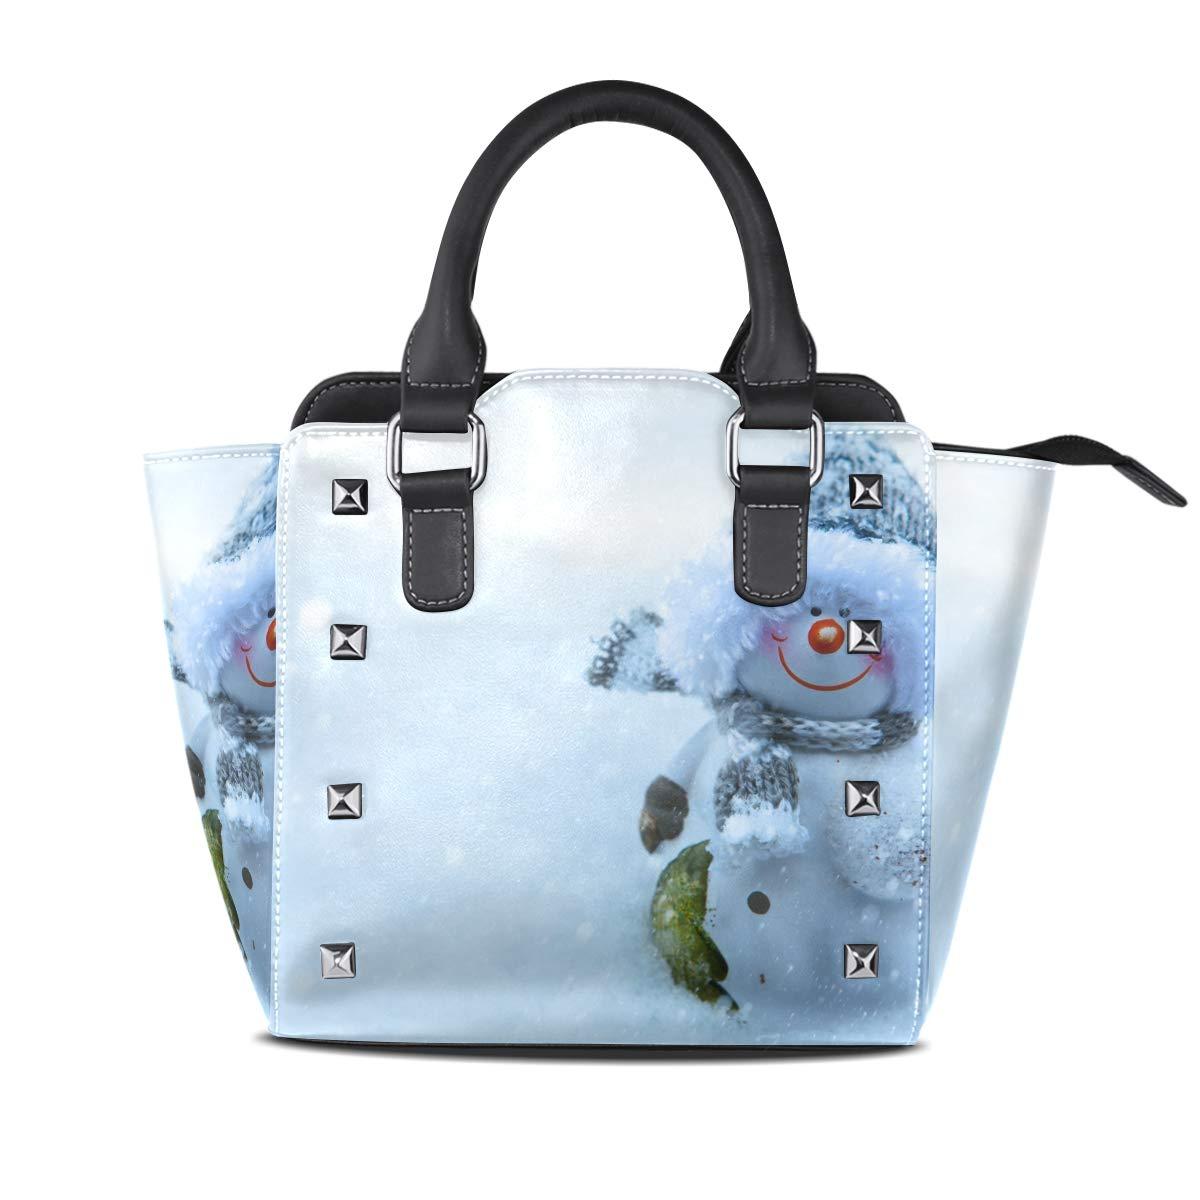 Design 3 Handbag Snowman Snowflake Snowball And Elk Genuine Leather Tote Rivet Bag Shoulder Strap Top Handle Women